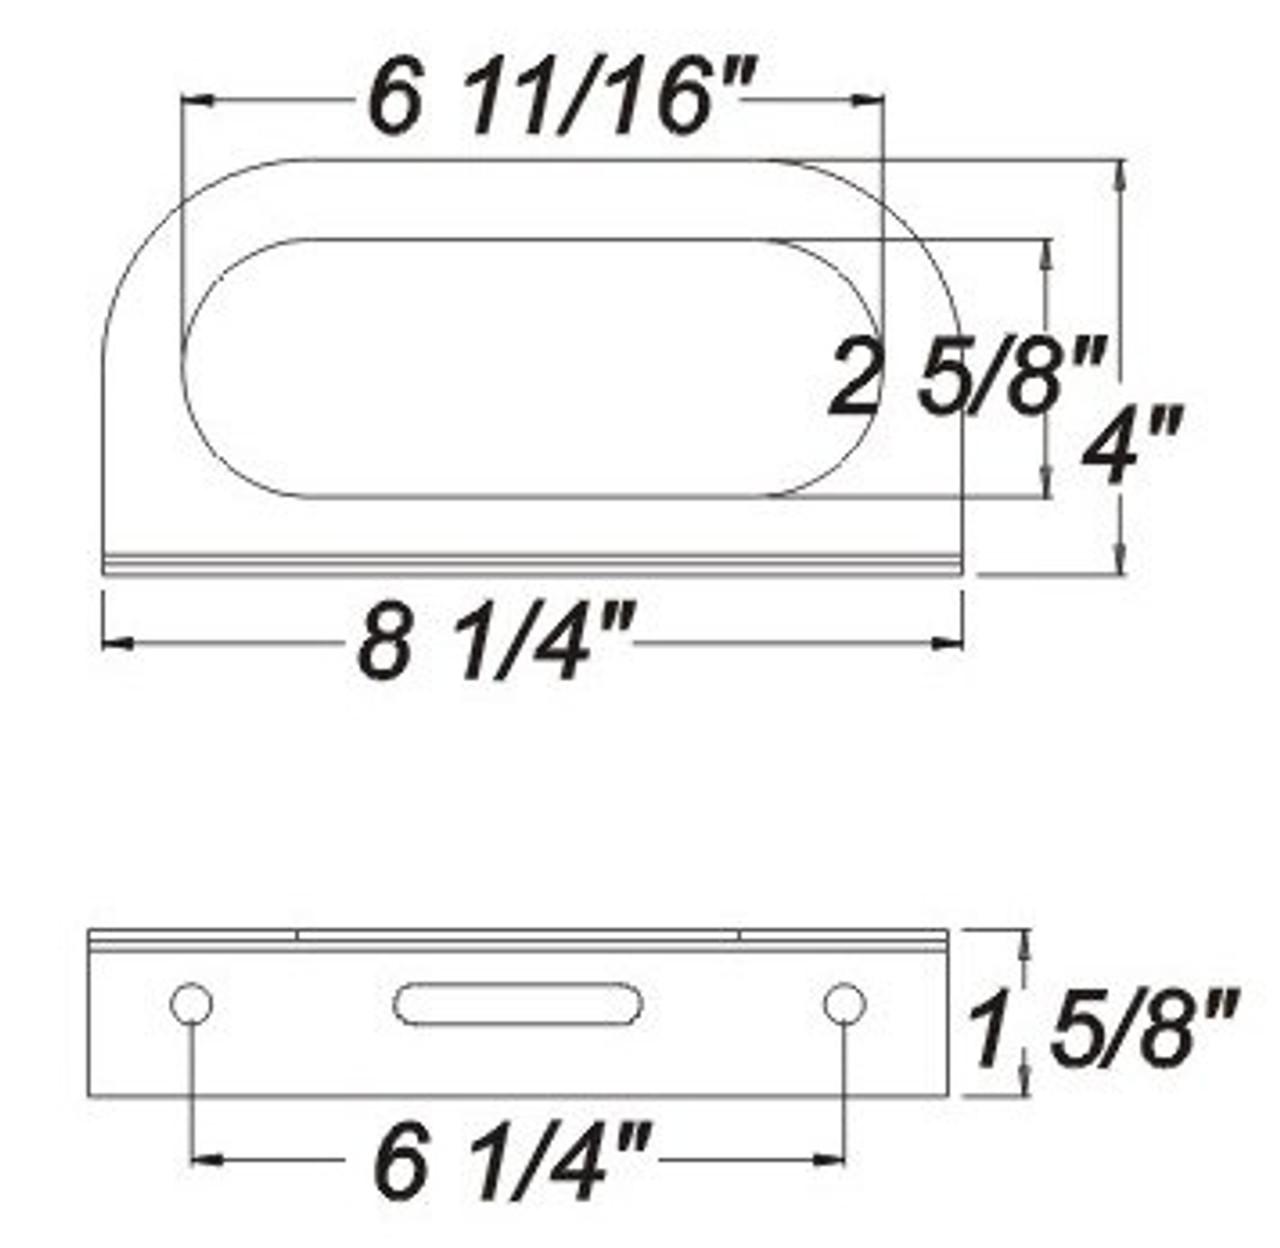 "OPTRONICS / Steel mounting bracket for 6"" lights, powder coated, black / BK70BB"